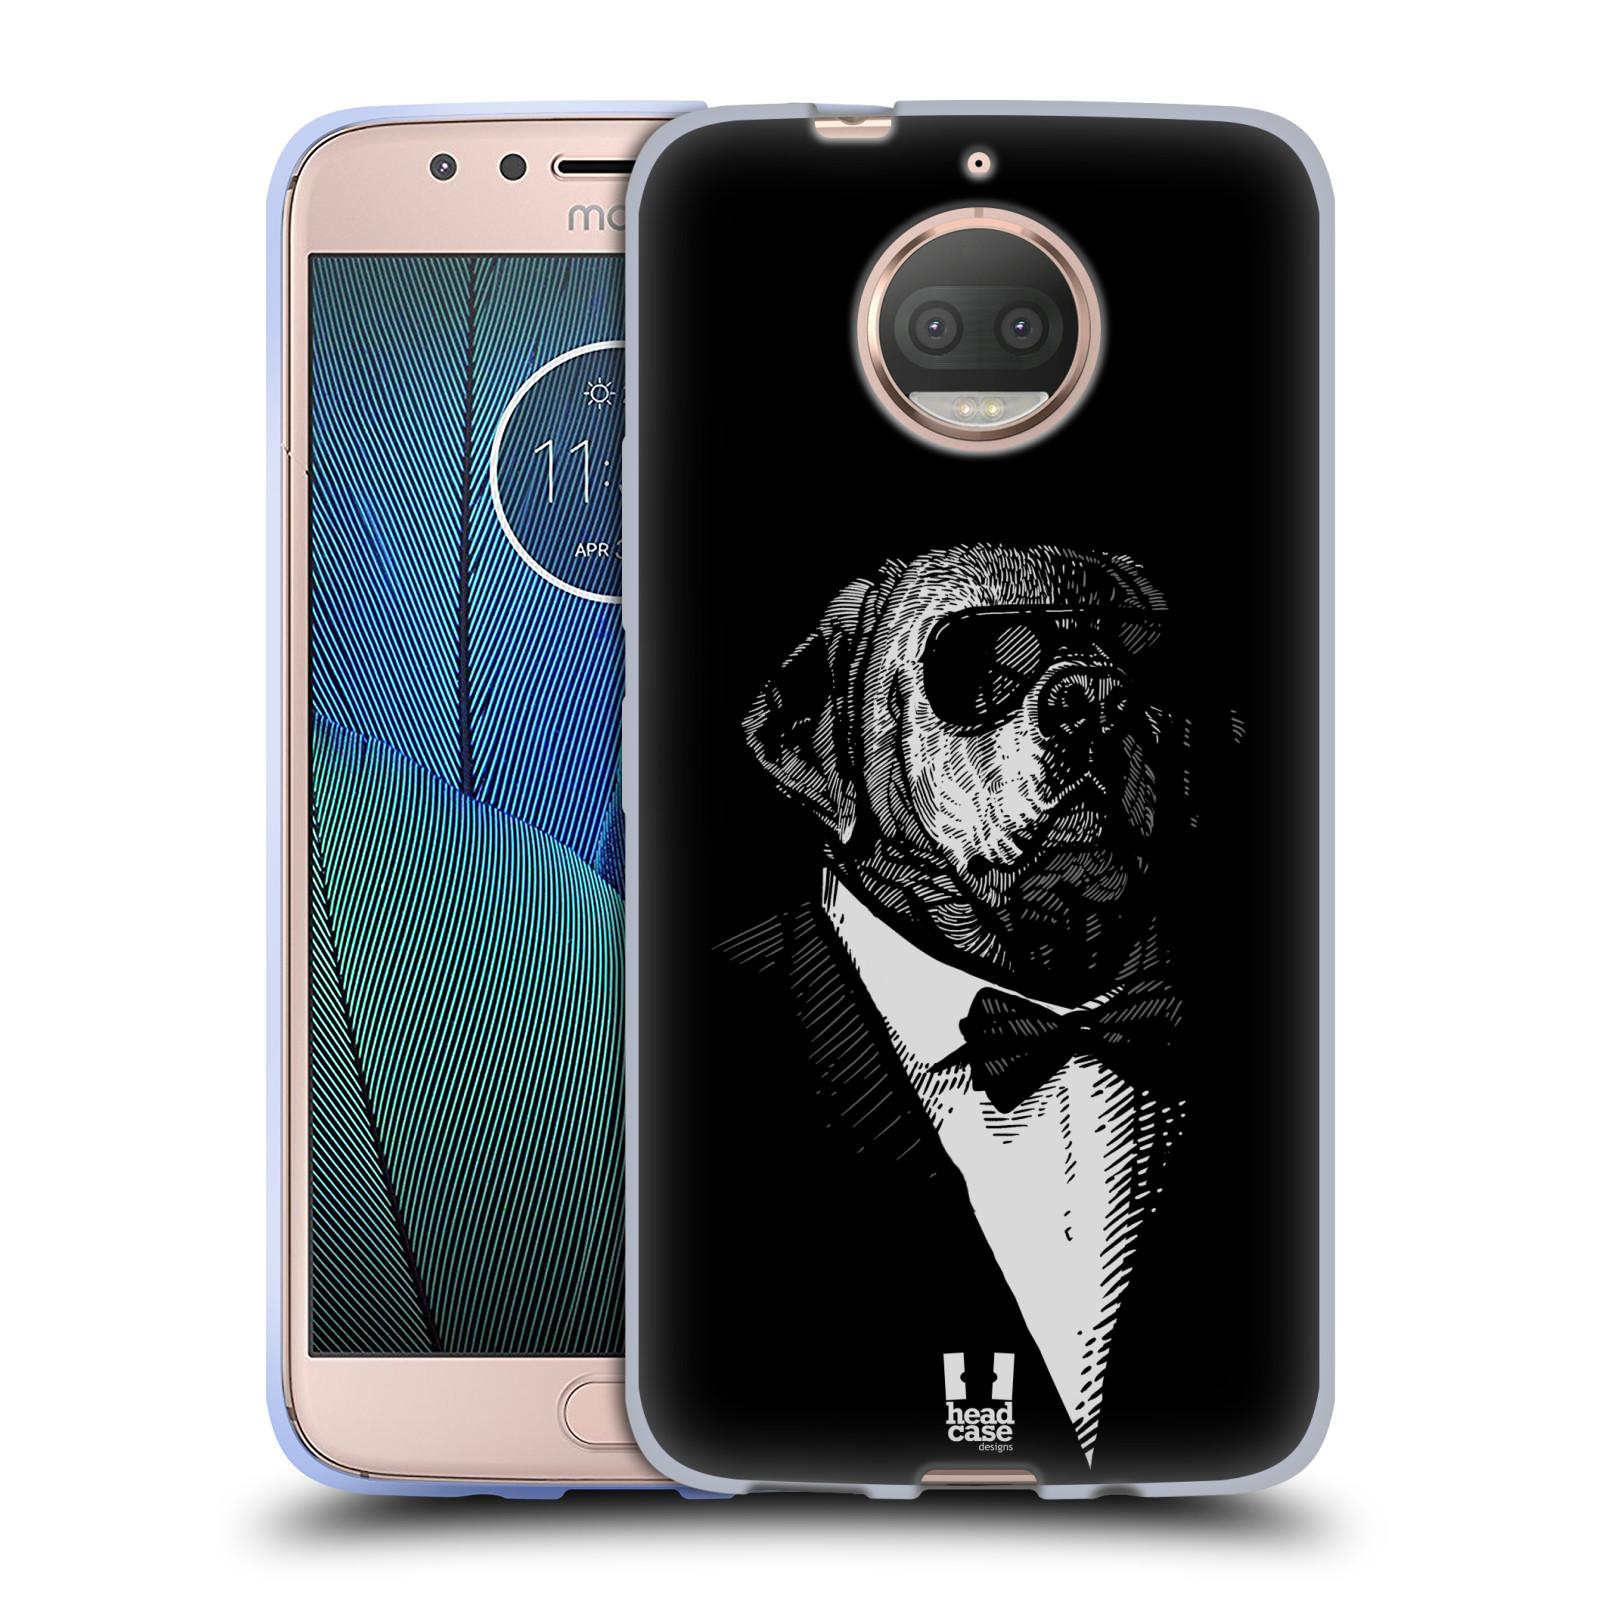 HEAD CASE silikonový obal na mobil Lenovo Moto G5s PLUS vzor Zvíře v obleku pes